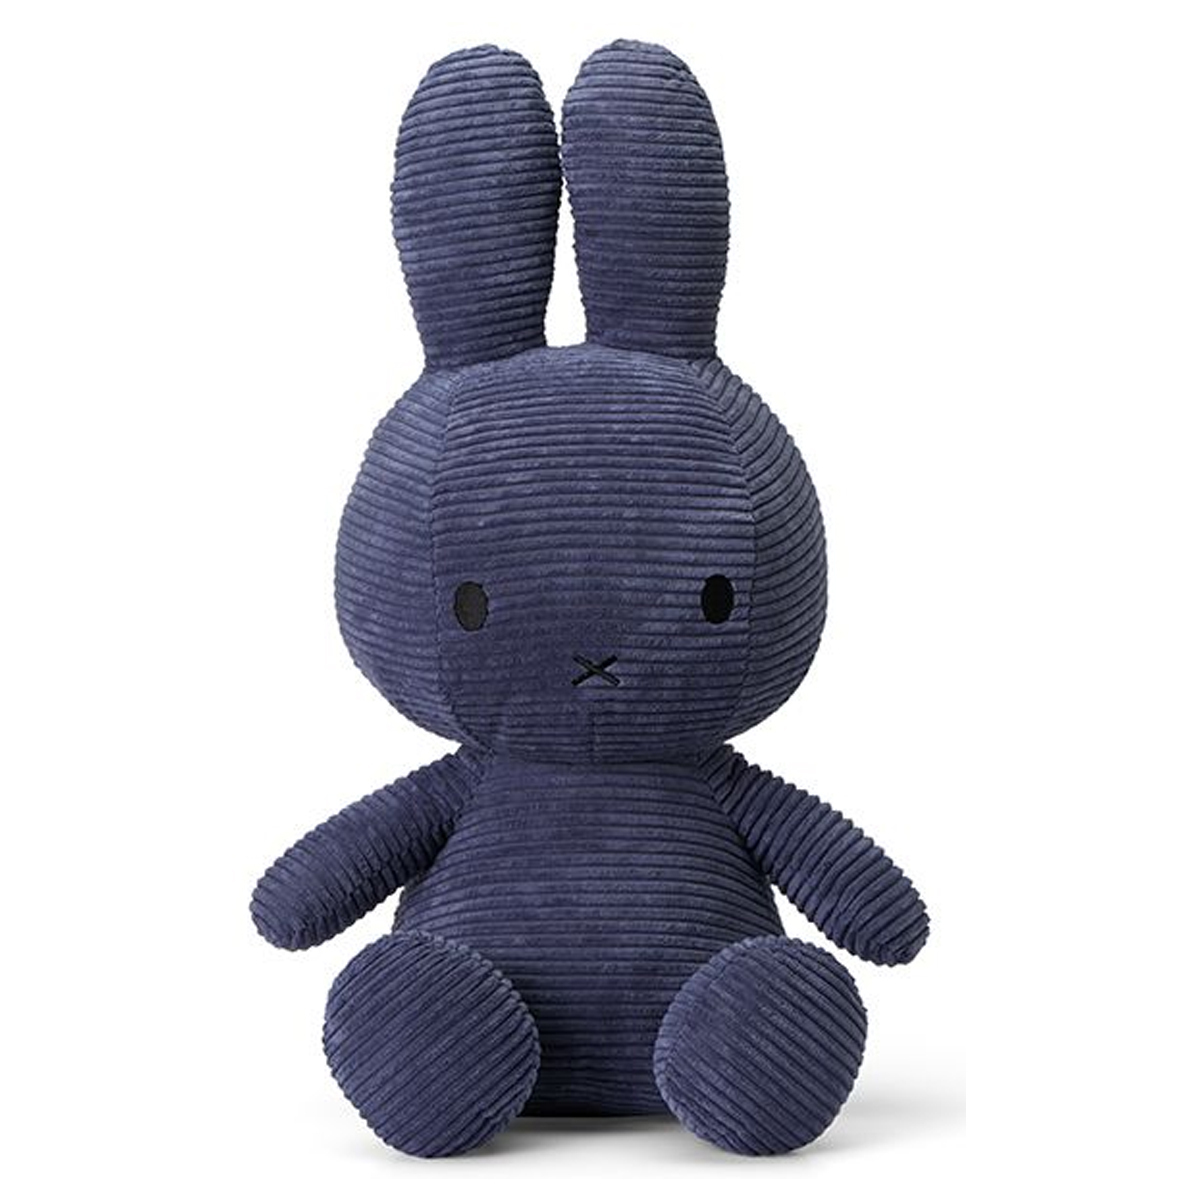 Peluche Lapin Miffy Bleu Nuit - Grand Lapin Miffy Bleu Nuit 50 cm